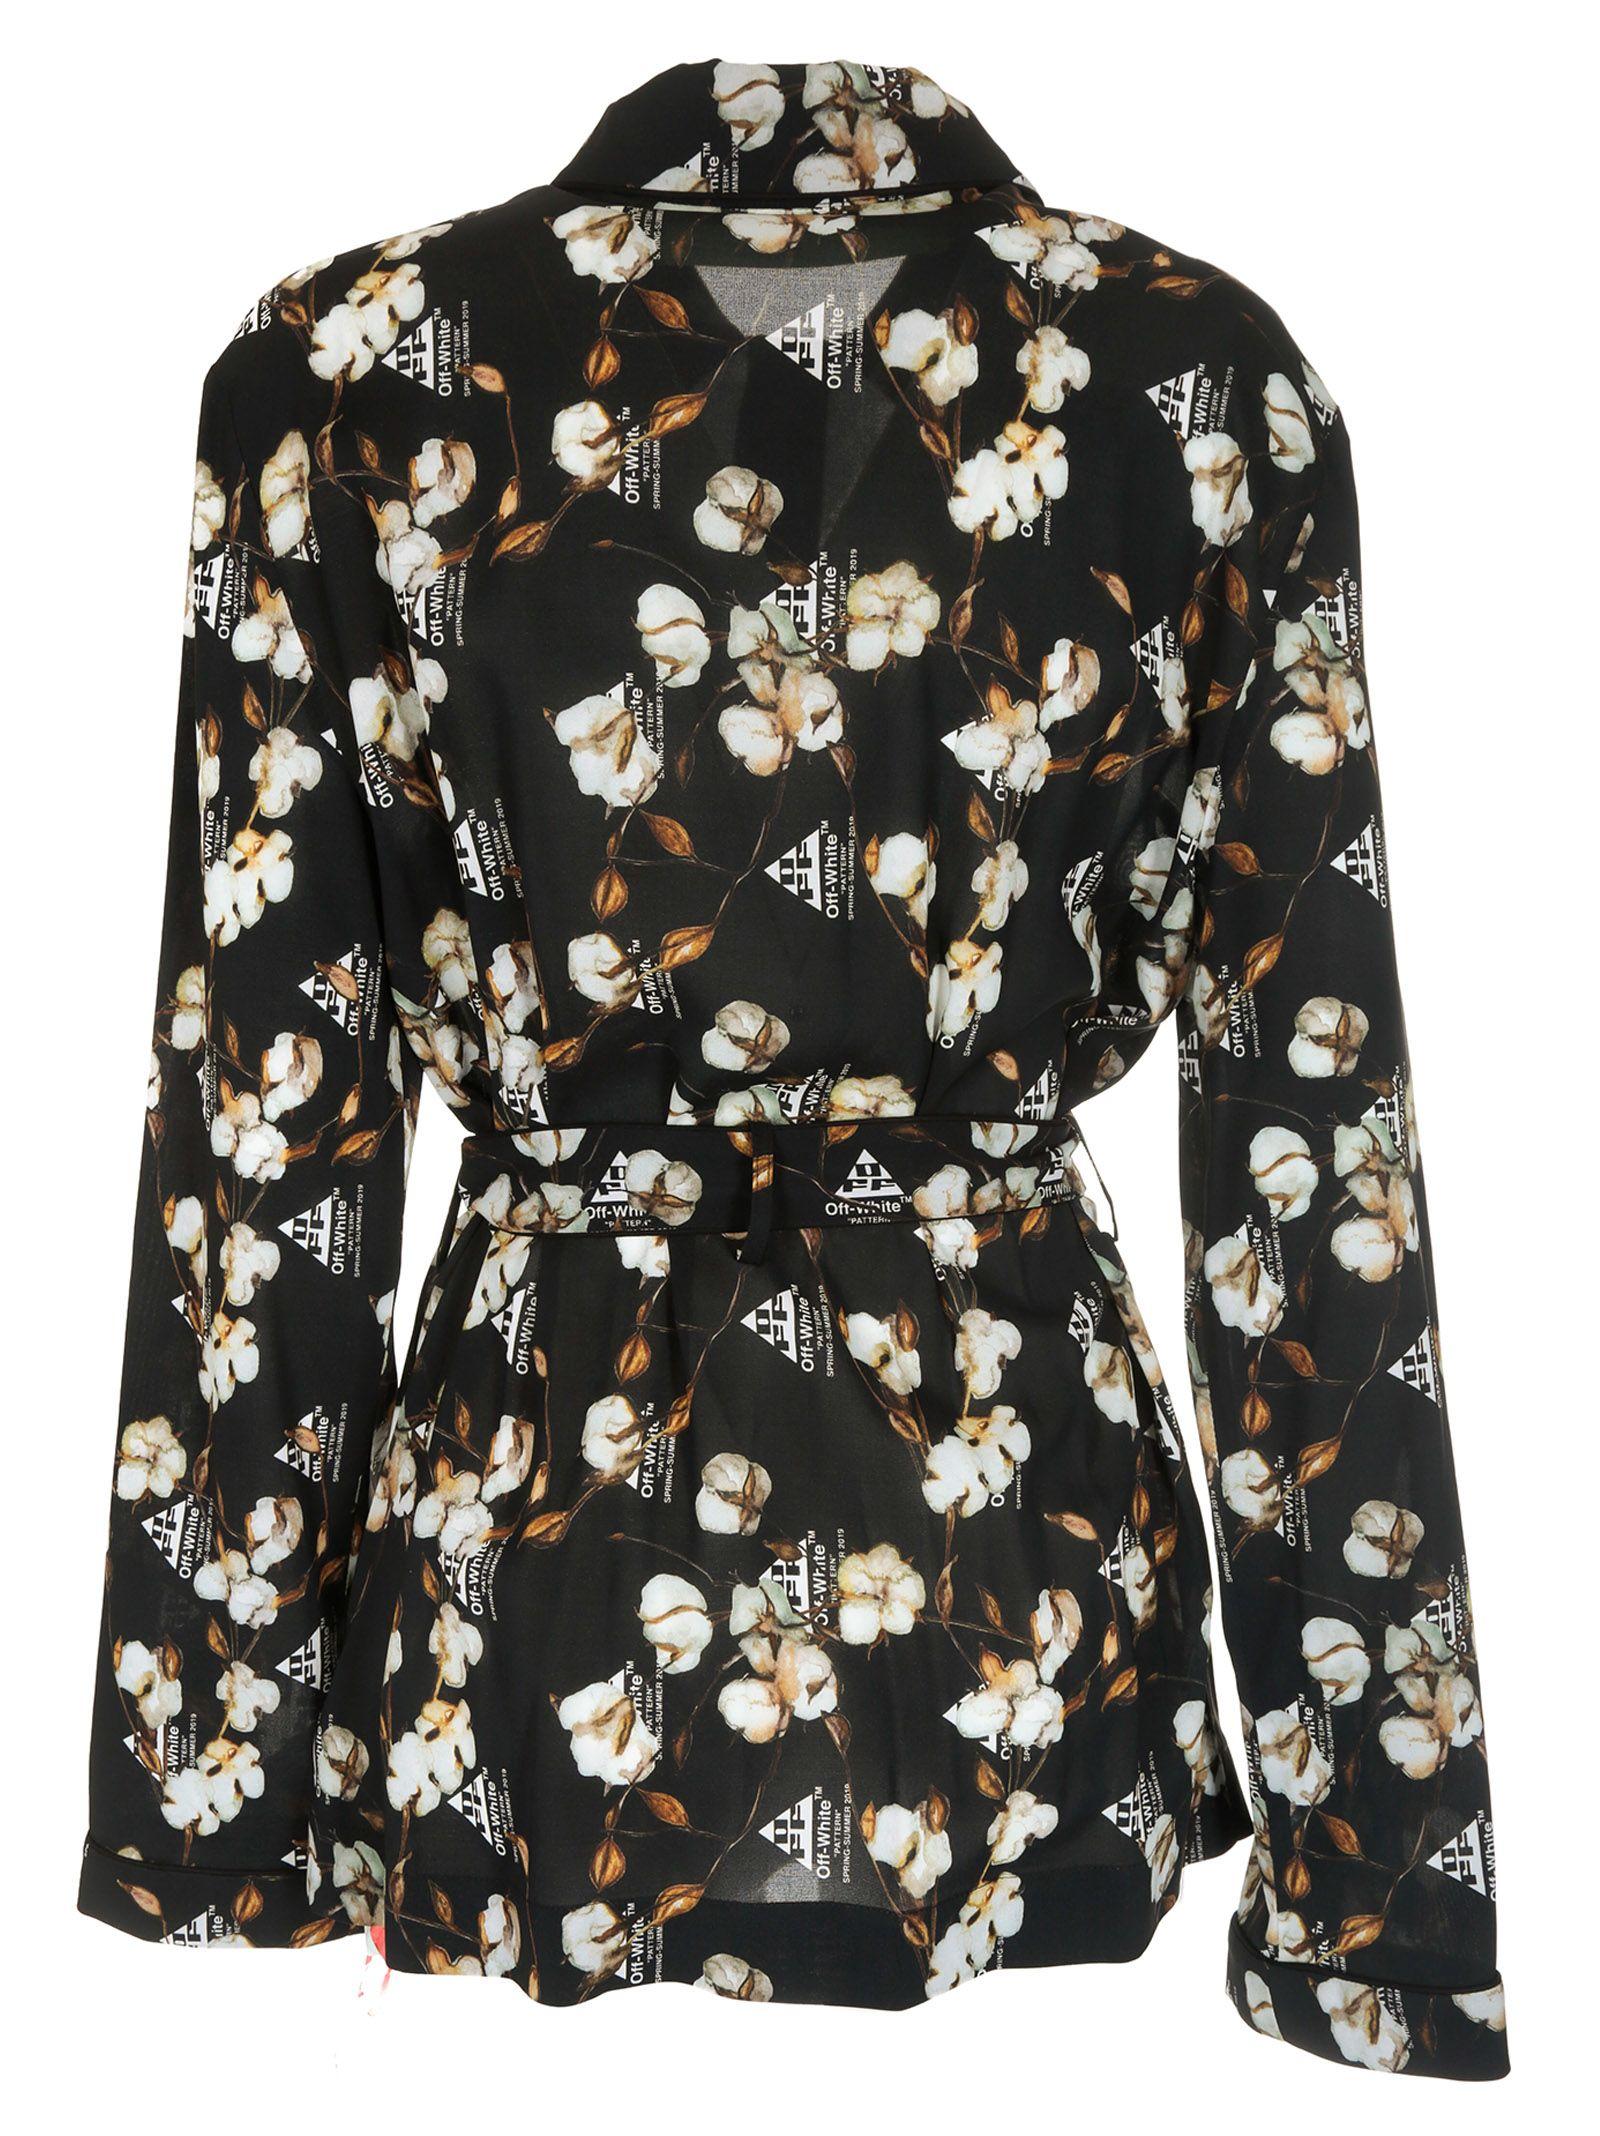 ea95bef02e82 Off-White Off-white Floral Crepe Pajama Shirt - Basic - 10798209 ...